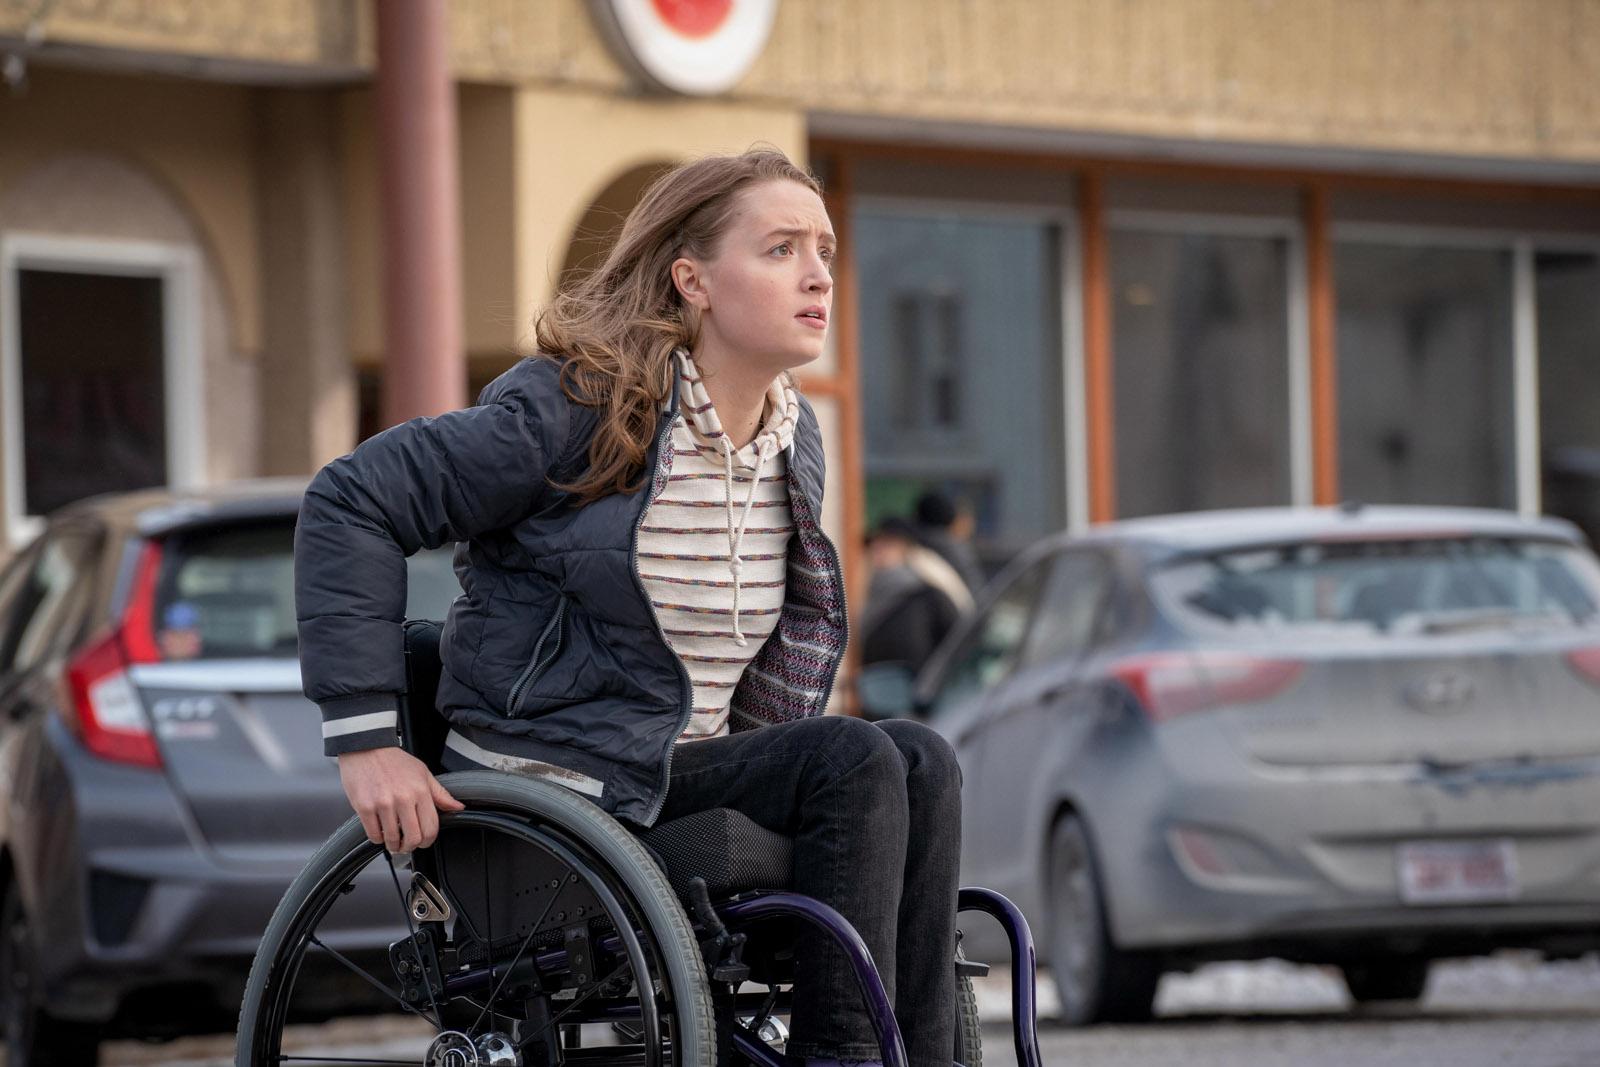 Chloe (Kiera Allen) in Hulu thriller Run (Photo by: Allen Fraser/Hulu)